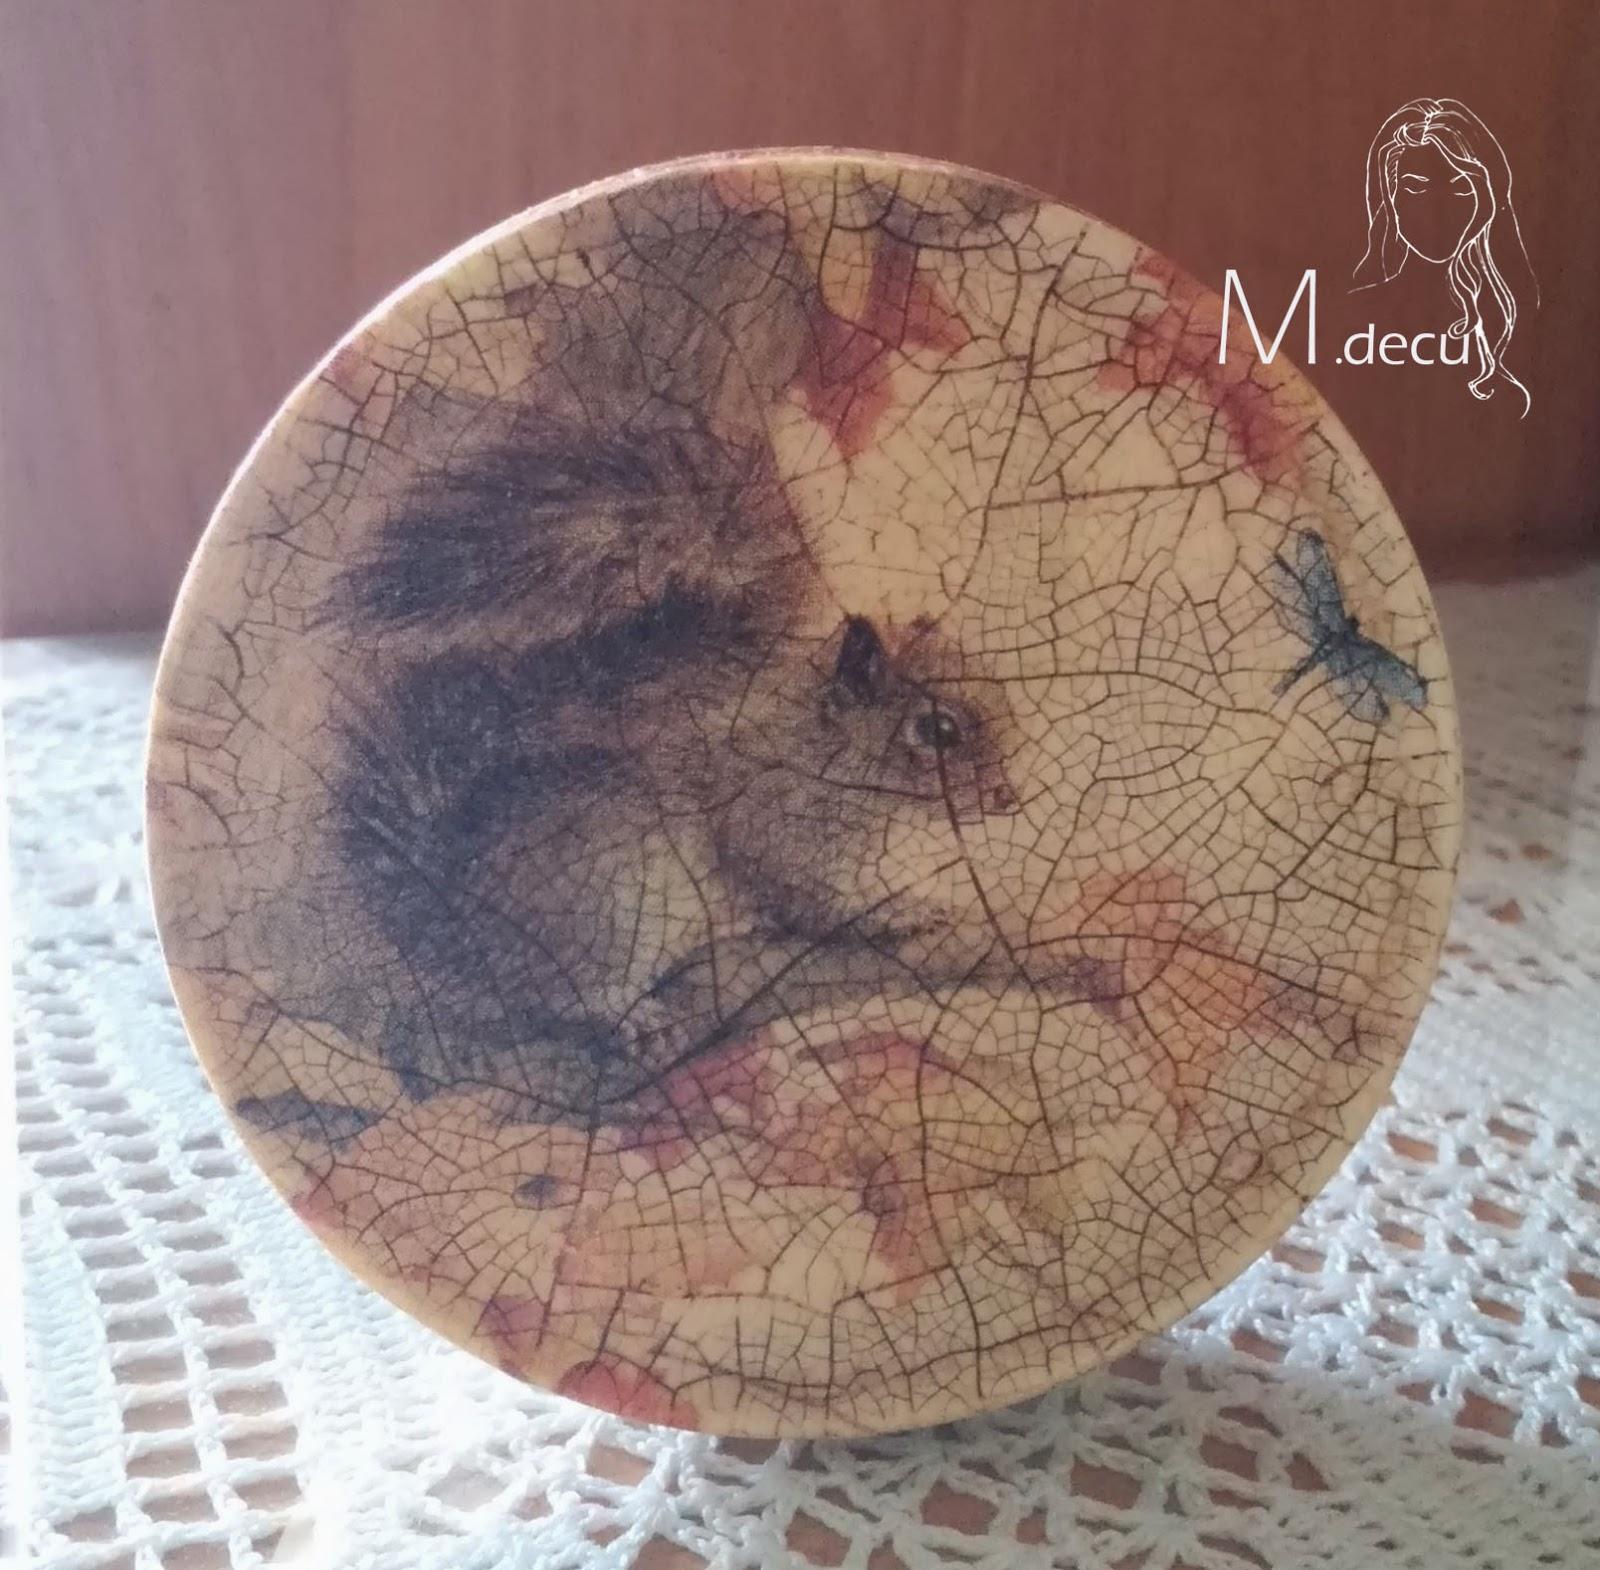 http://mdecu.blogspot.com/2014/12/wiewiorka-w-odcieniach-jesieni-squirrel.html